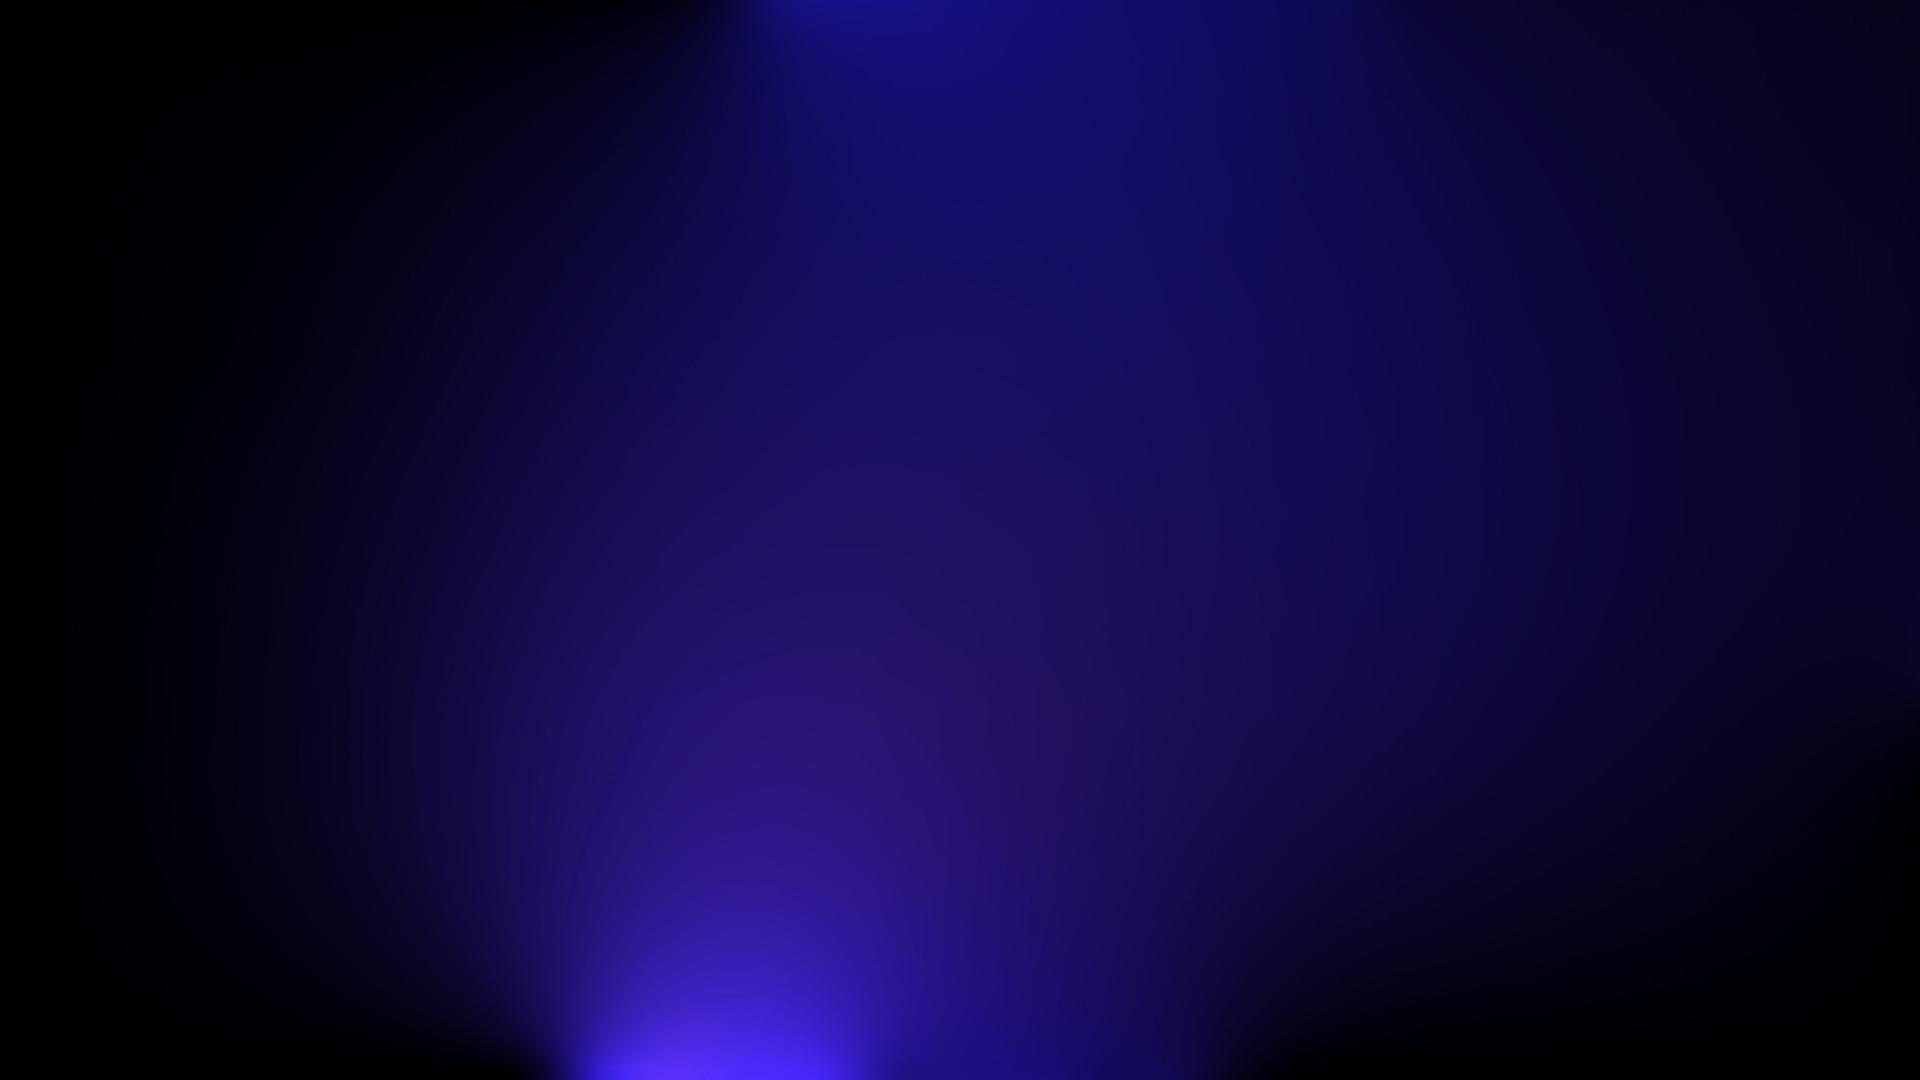 Dark-Blue-Full-HD-for-Background-1920×1080-px-